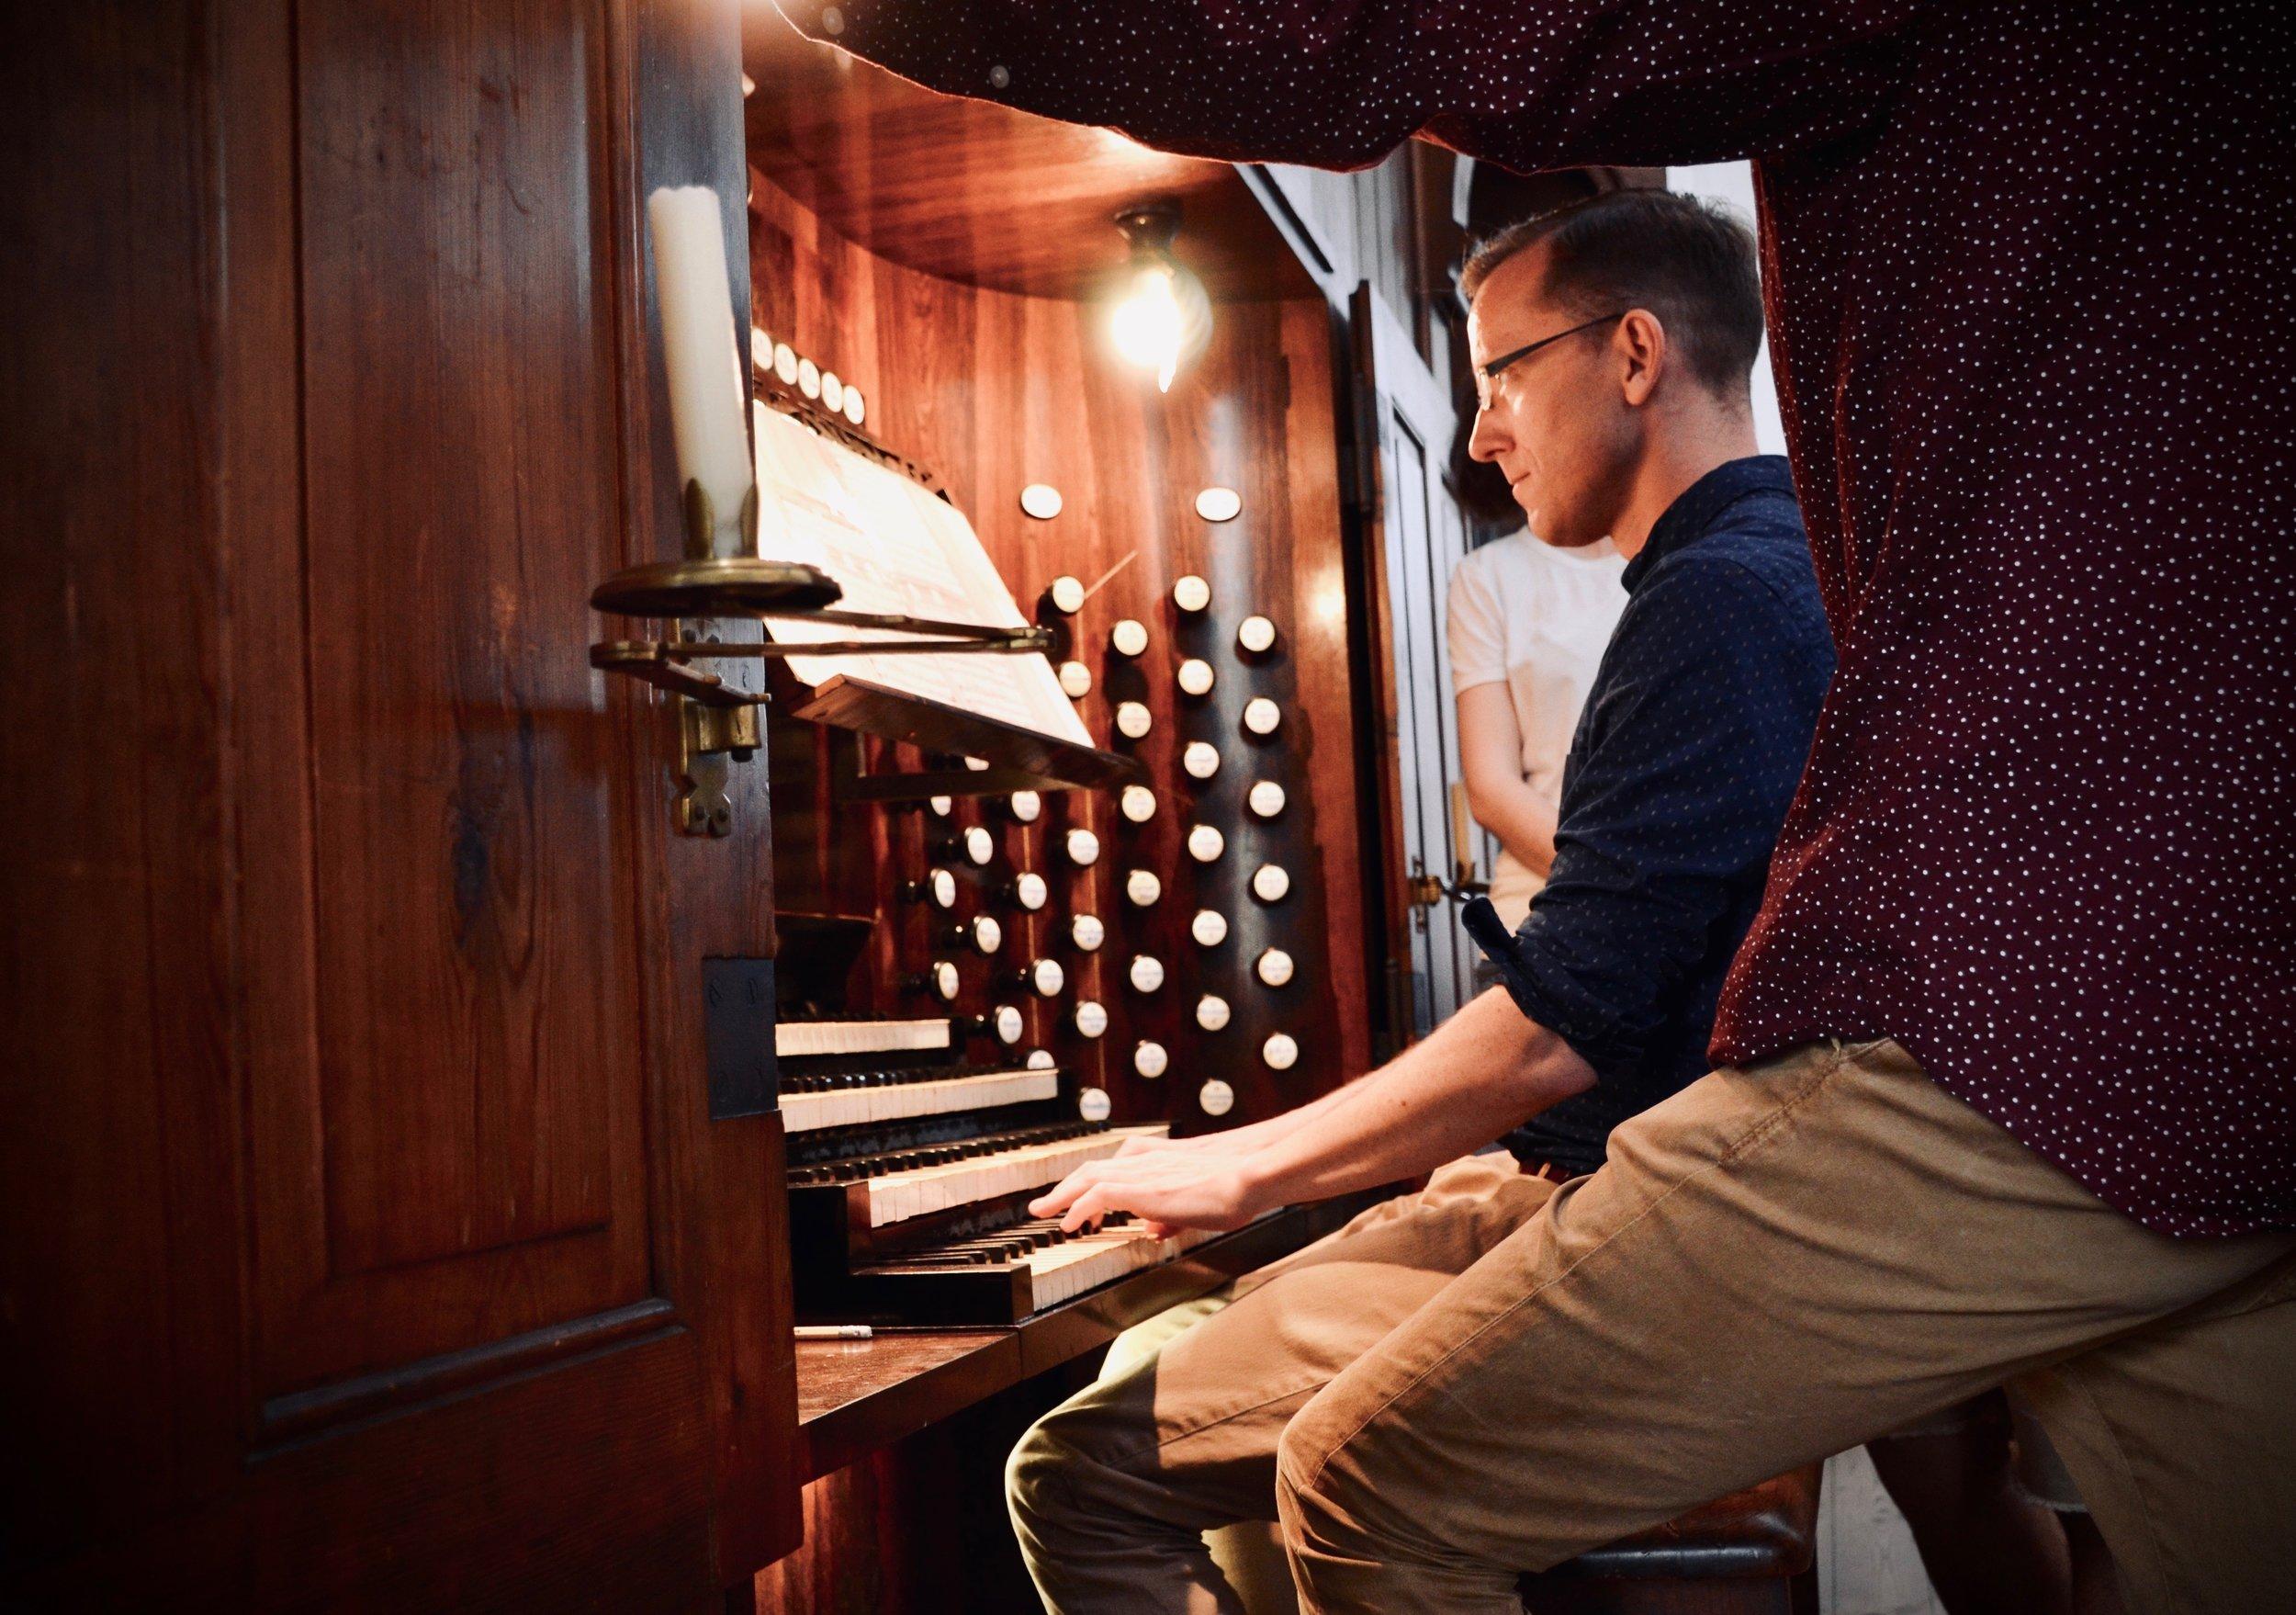 Christian Lane plays Mendelssohn, 1871 Ladegast Organ, Schwerin Dom. Boston Organ Studio.